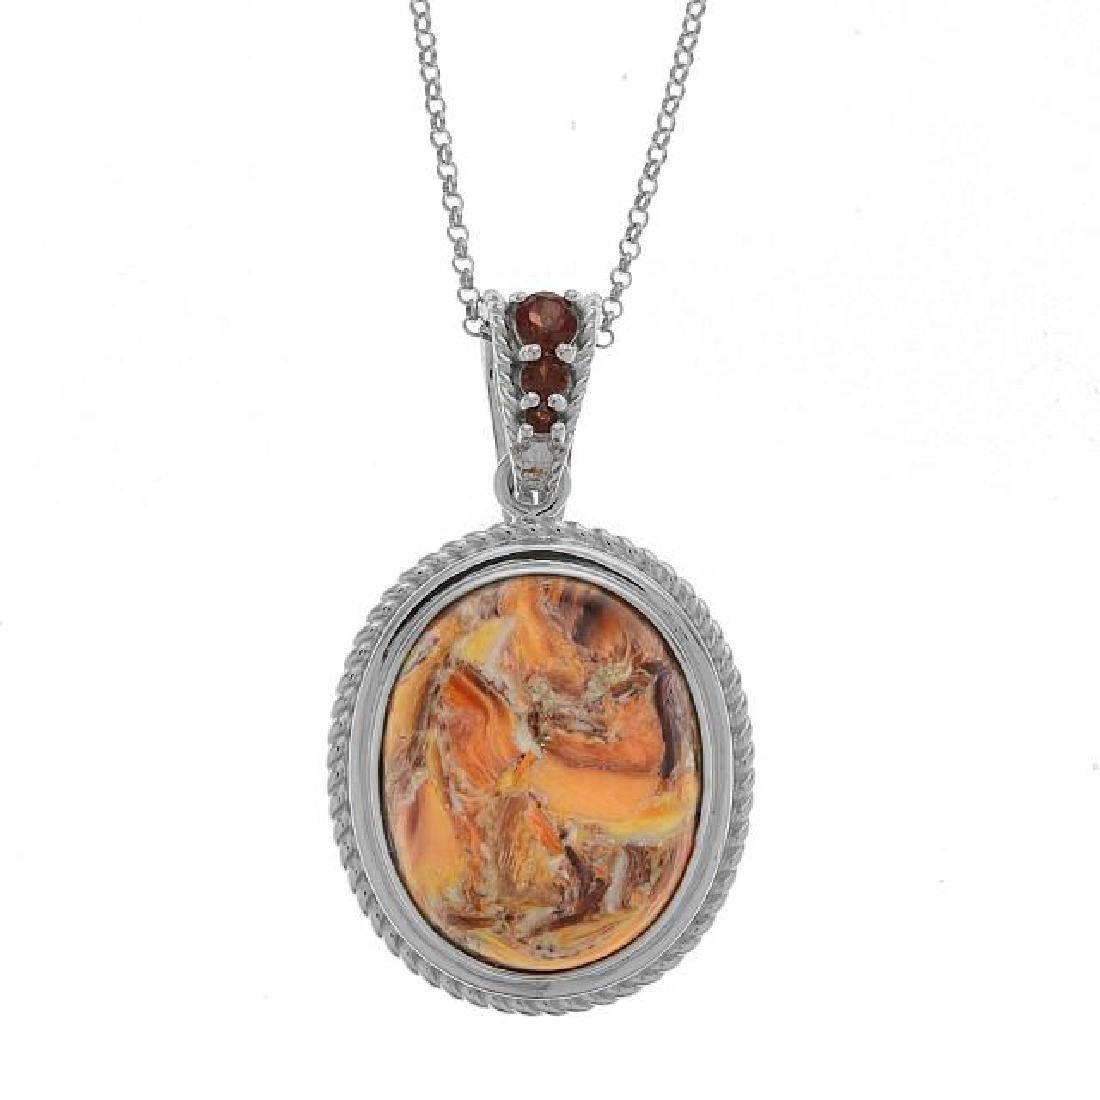 Sterling Silver Oval Lion's Paw & Garnet Pendant